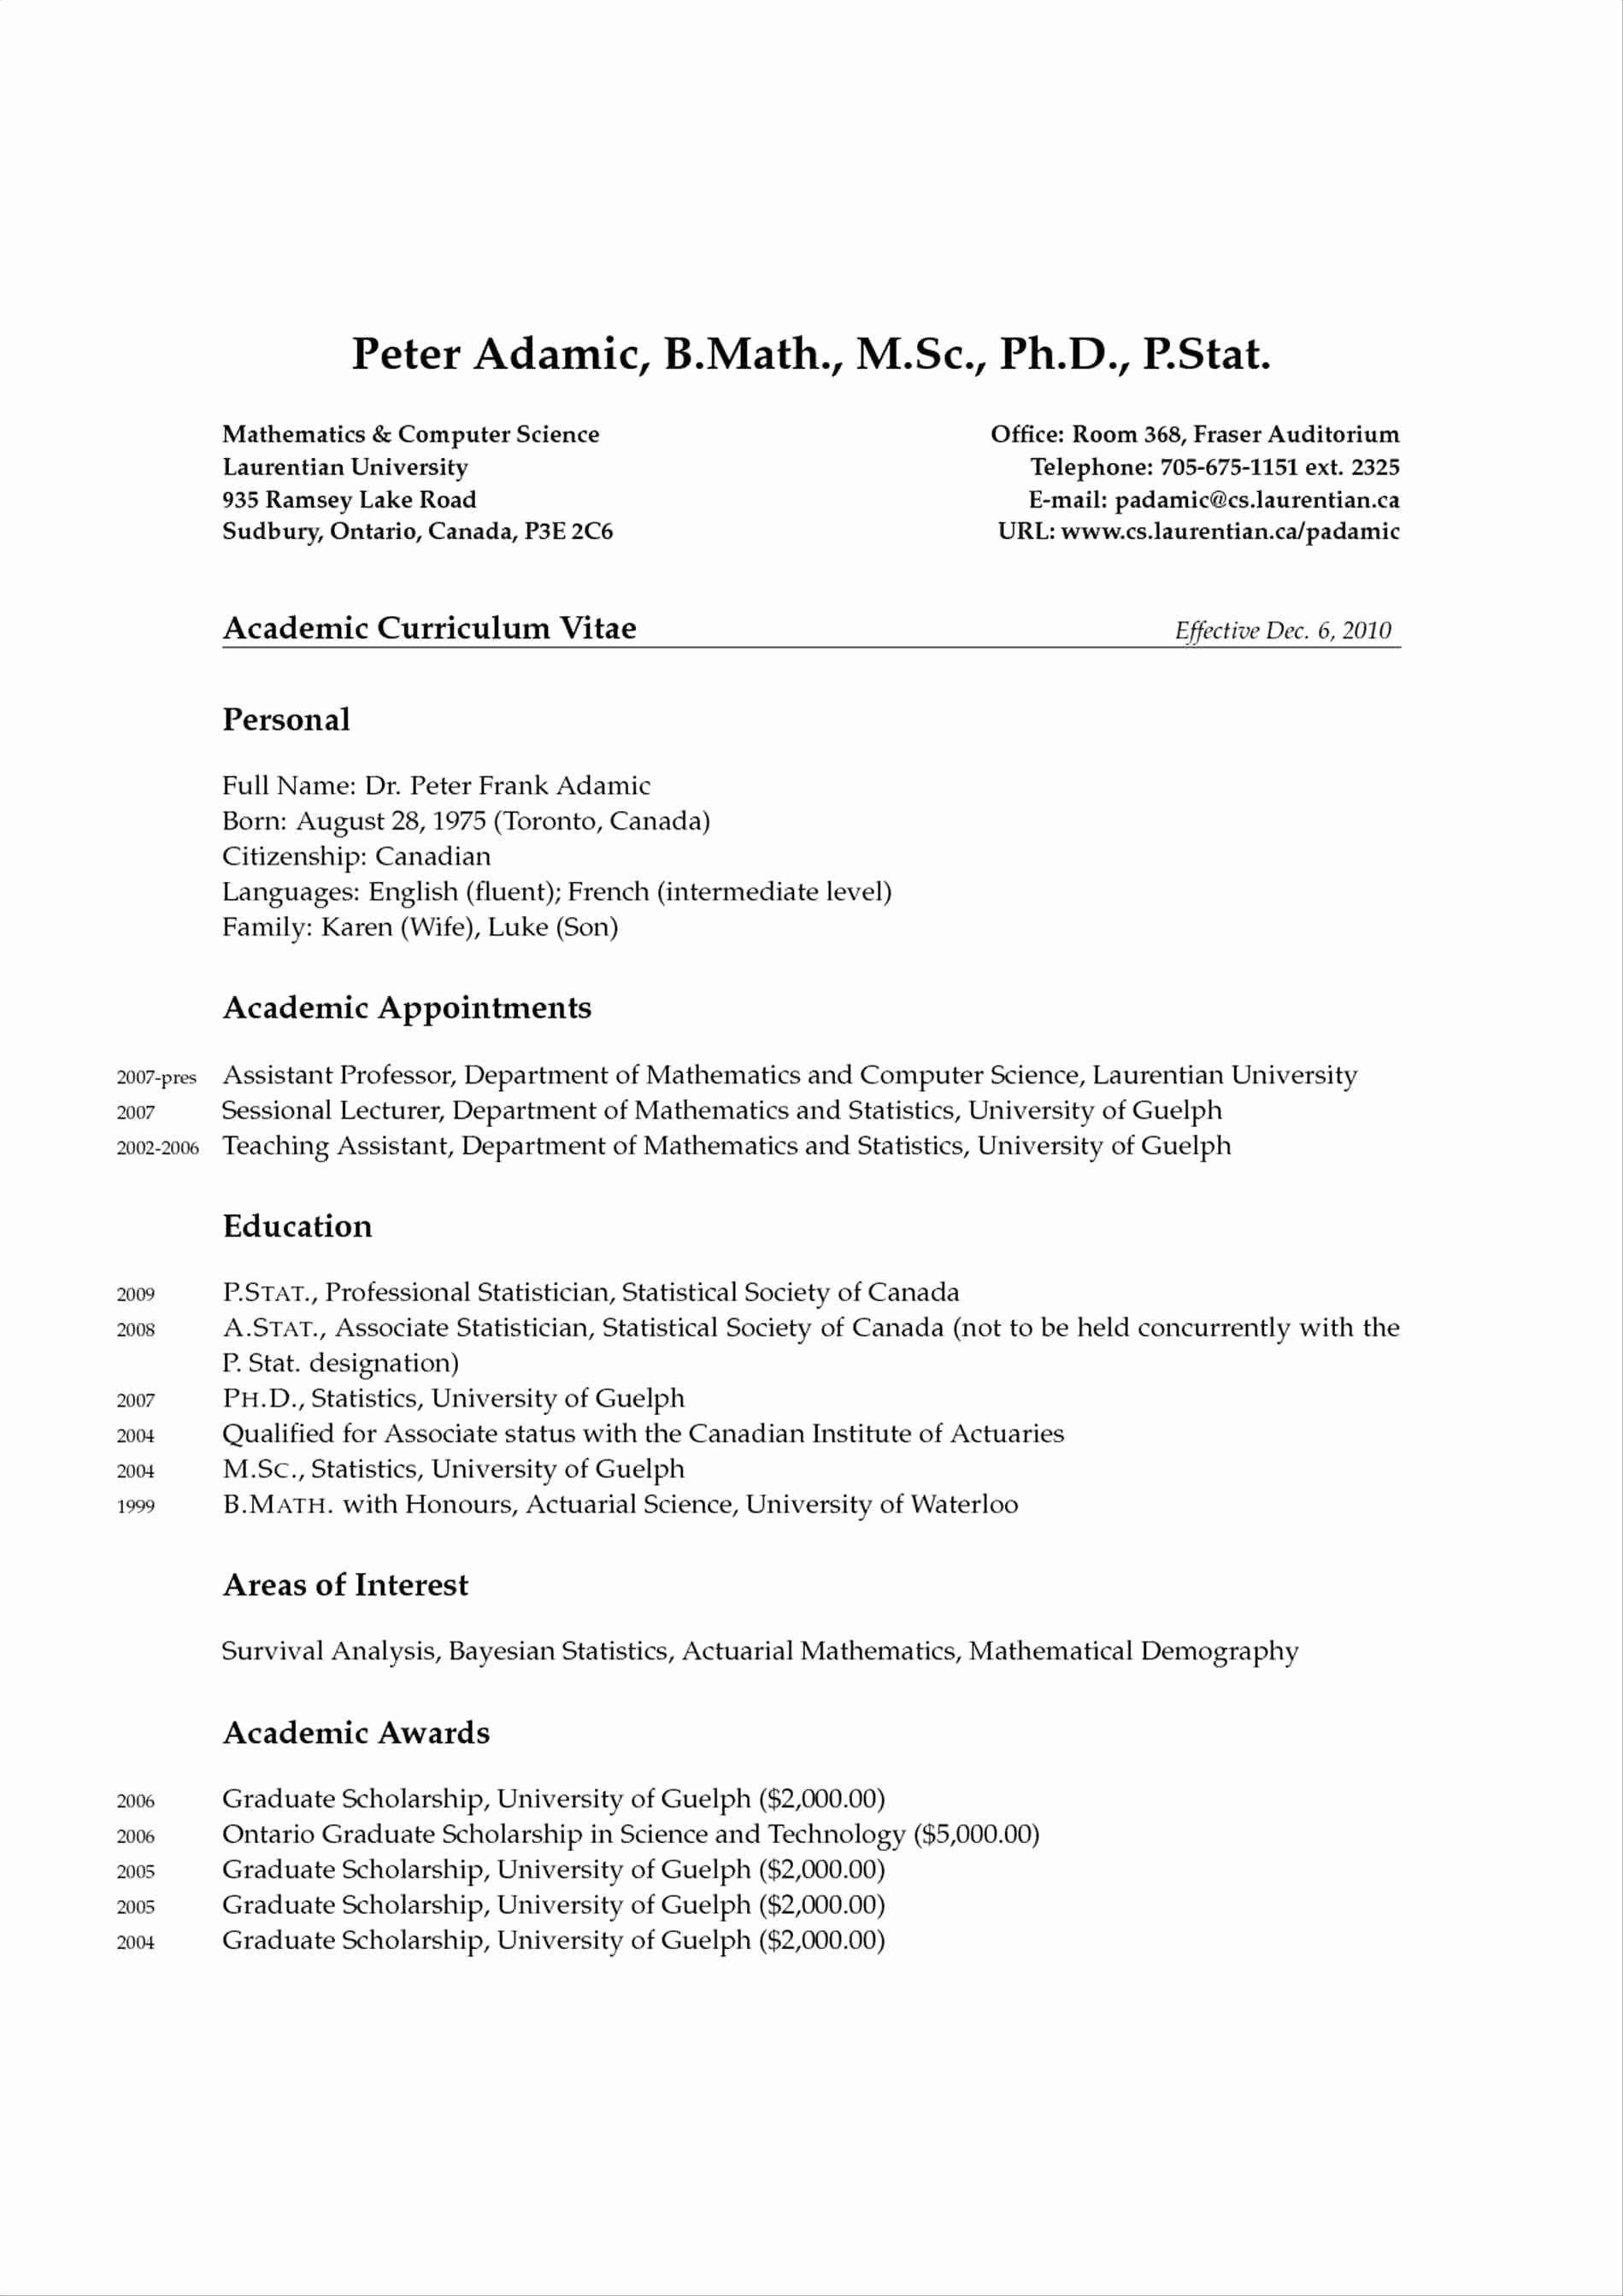 002 Archaicawful Latex Resume Template Phd Inspiration  Cv Graduate Student EconomicFull